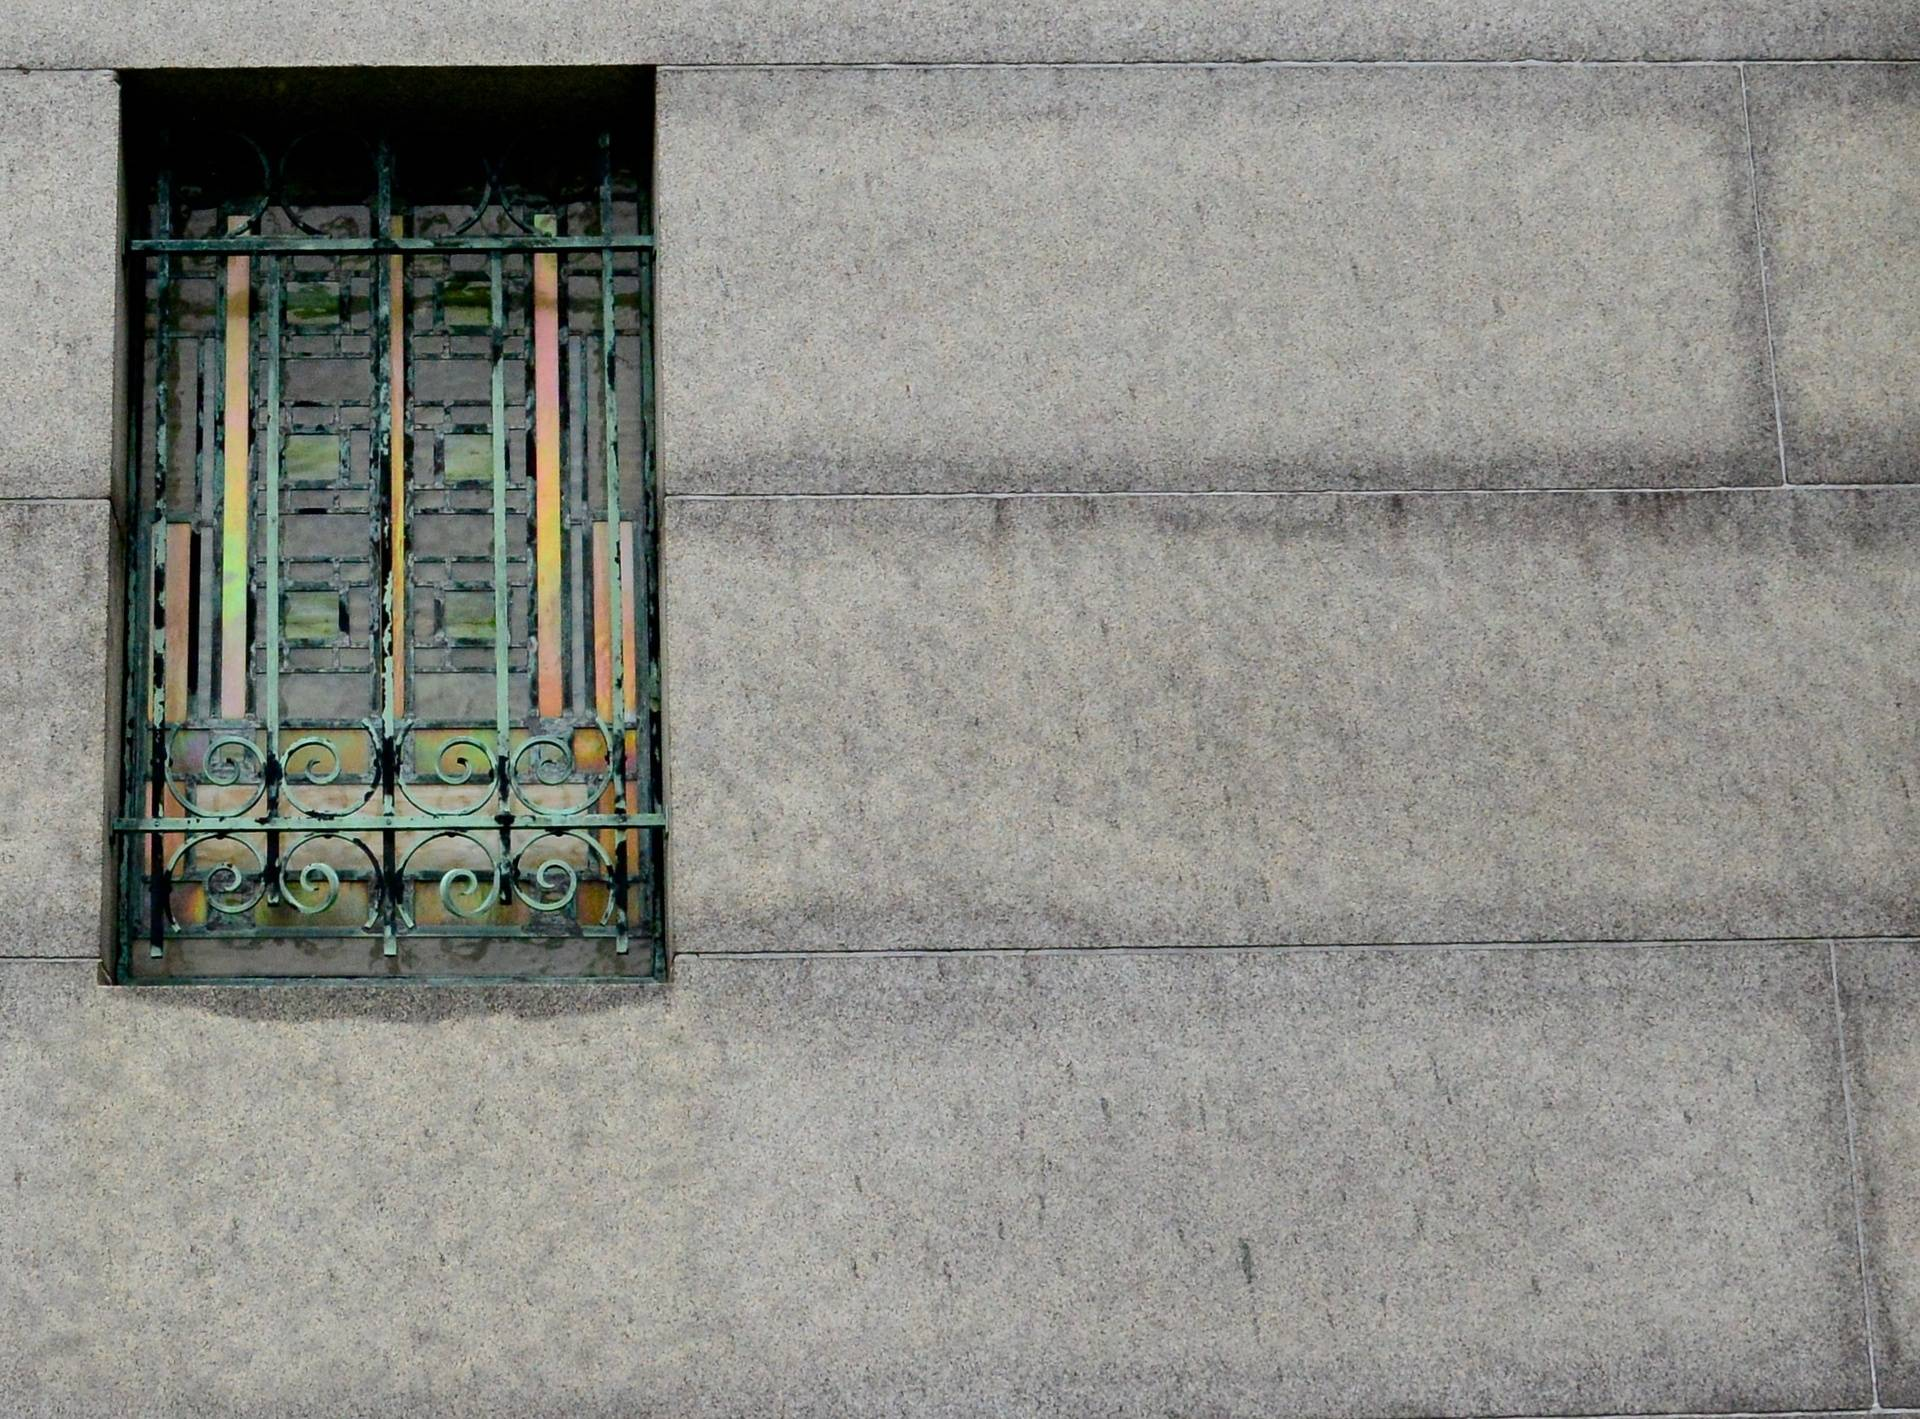 Back of mausoleum showing art glass